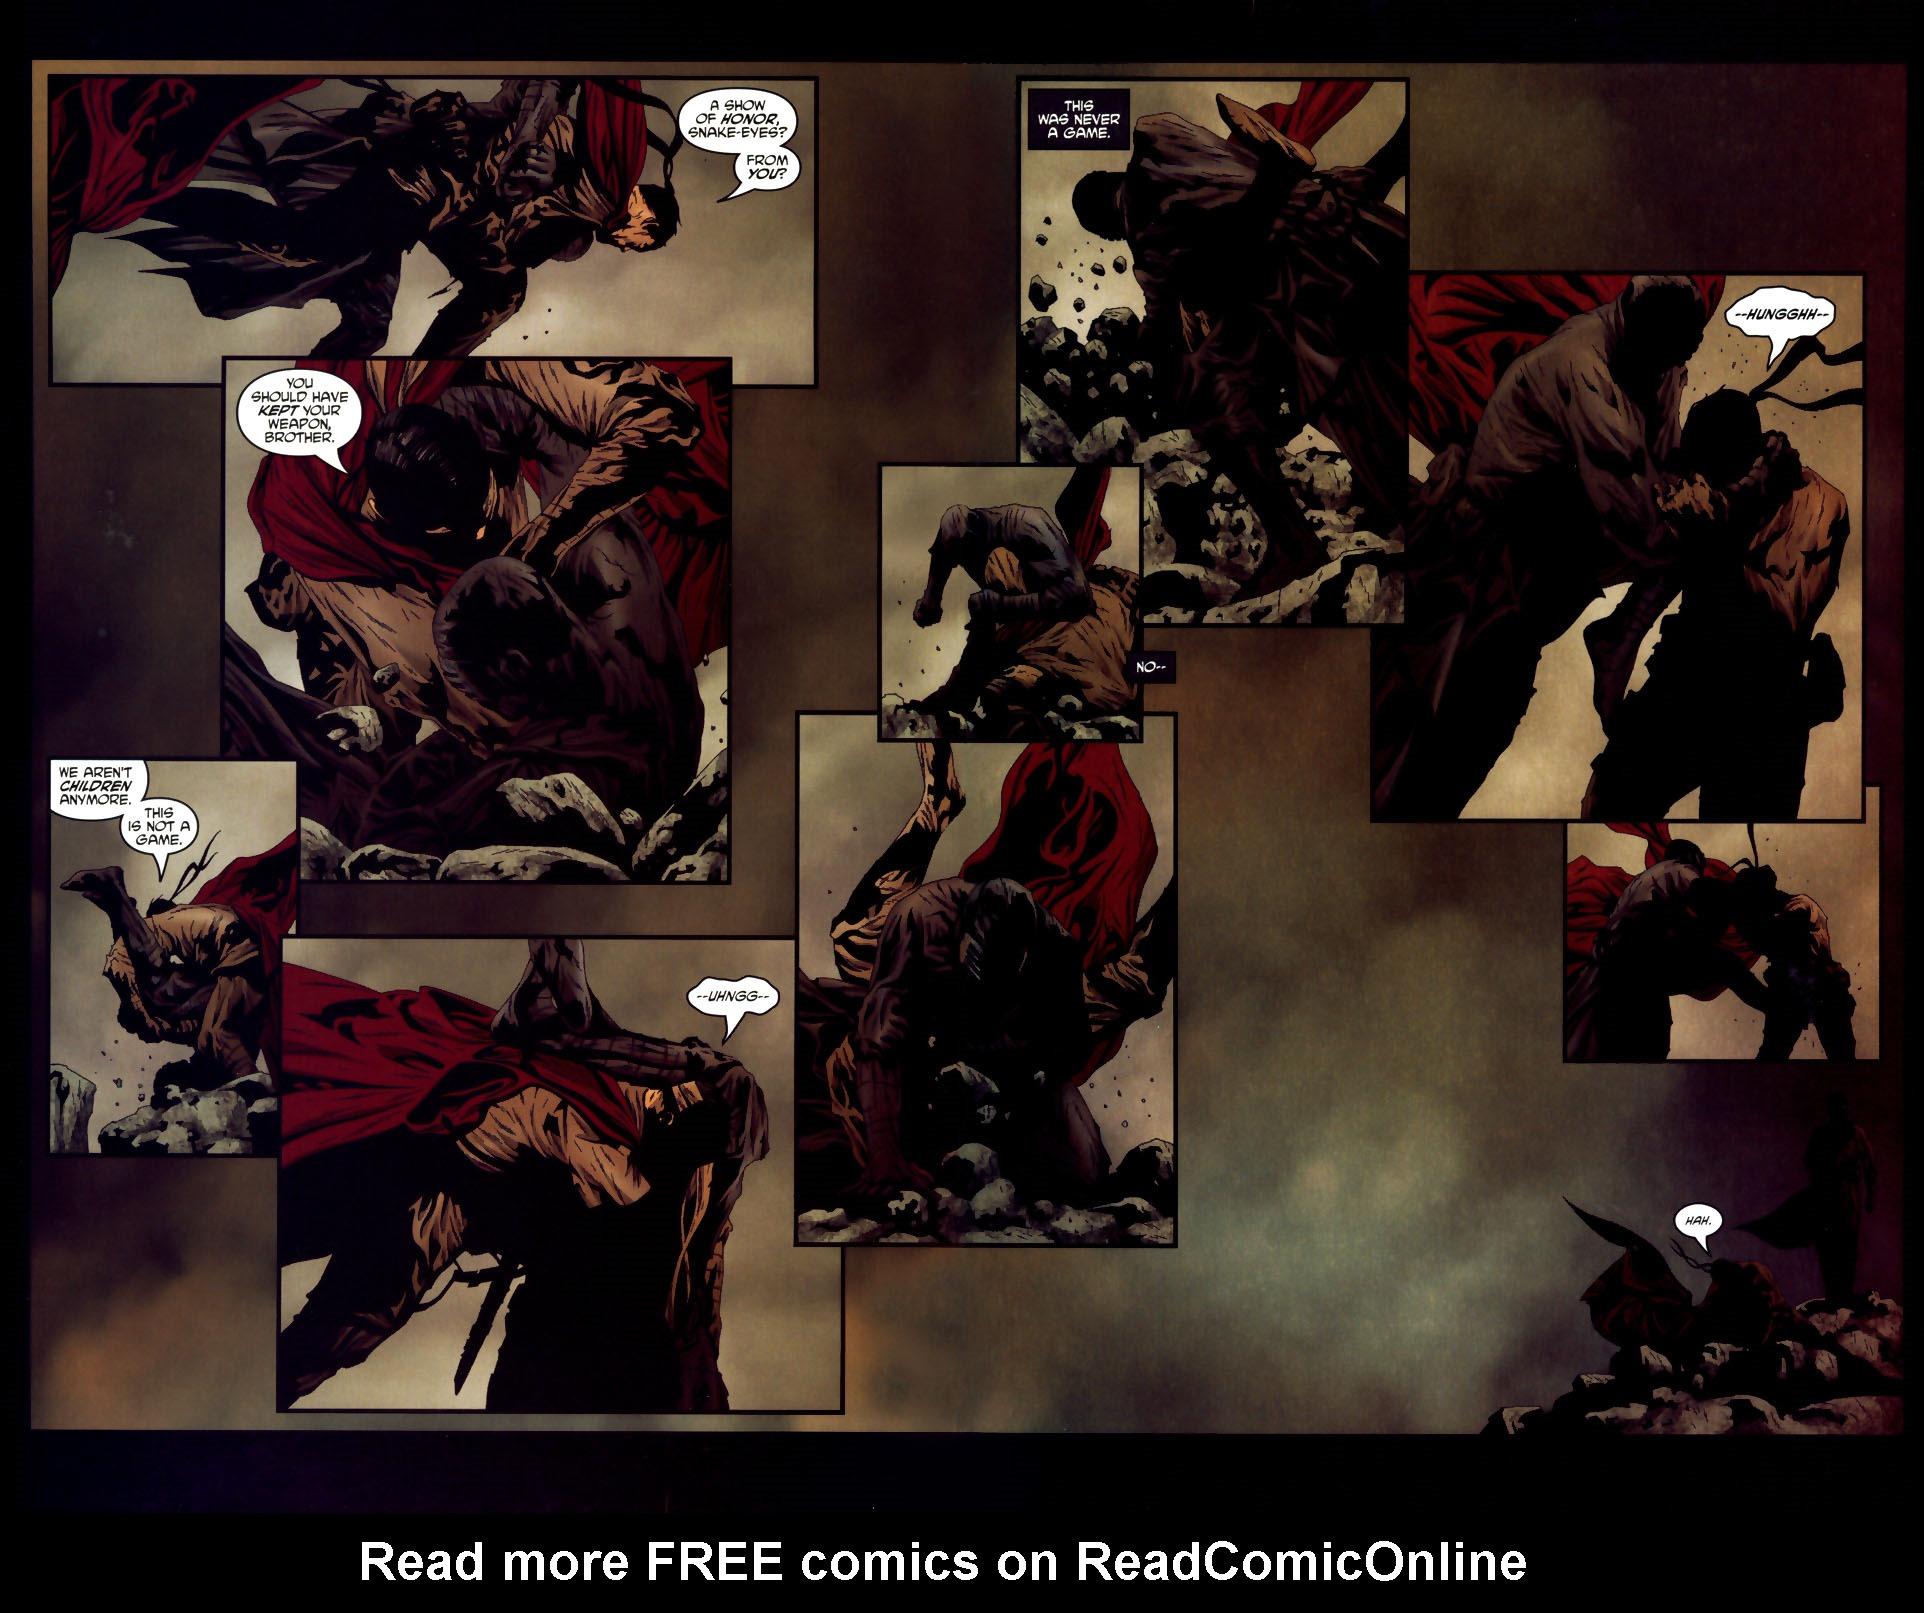 Read online Transformers/G.I. Joe comic -  Issue #3 - 15